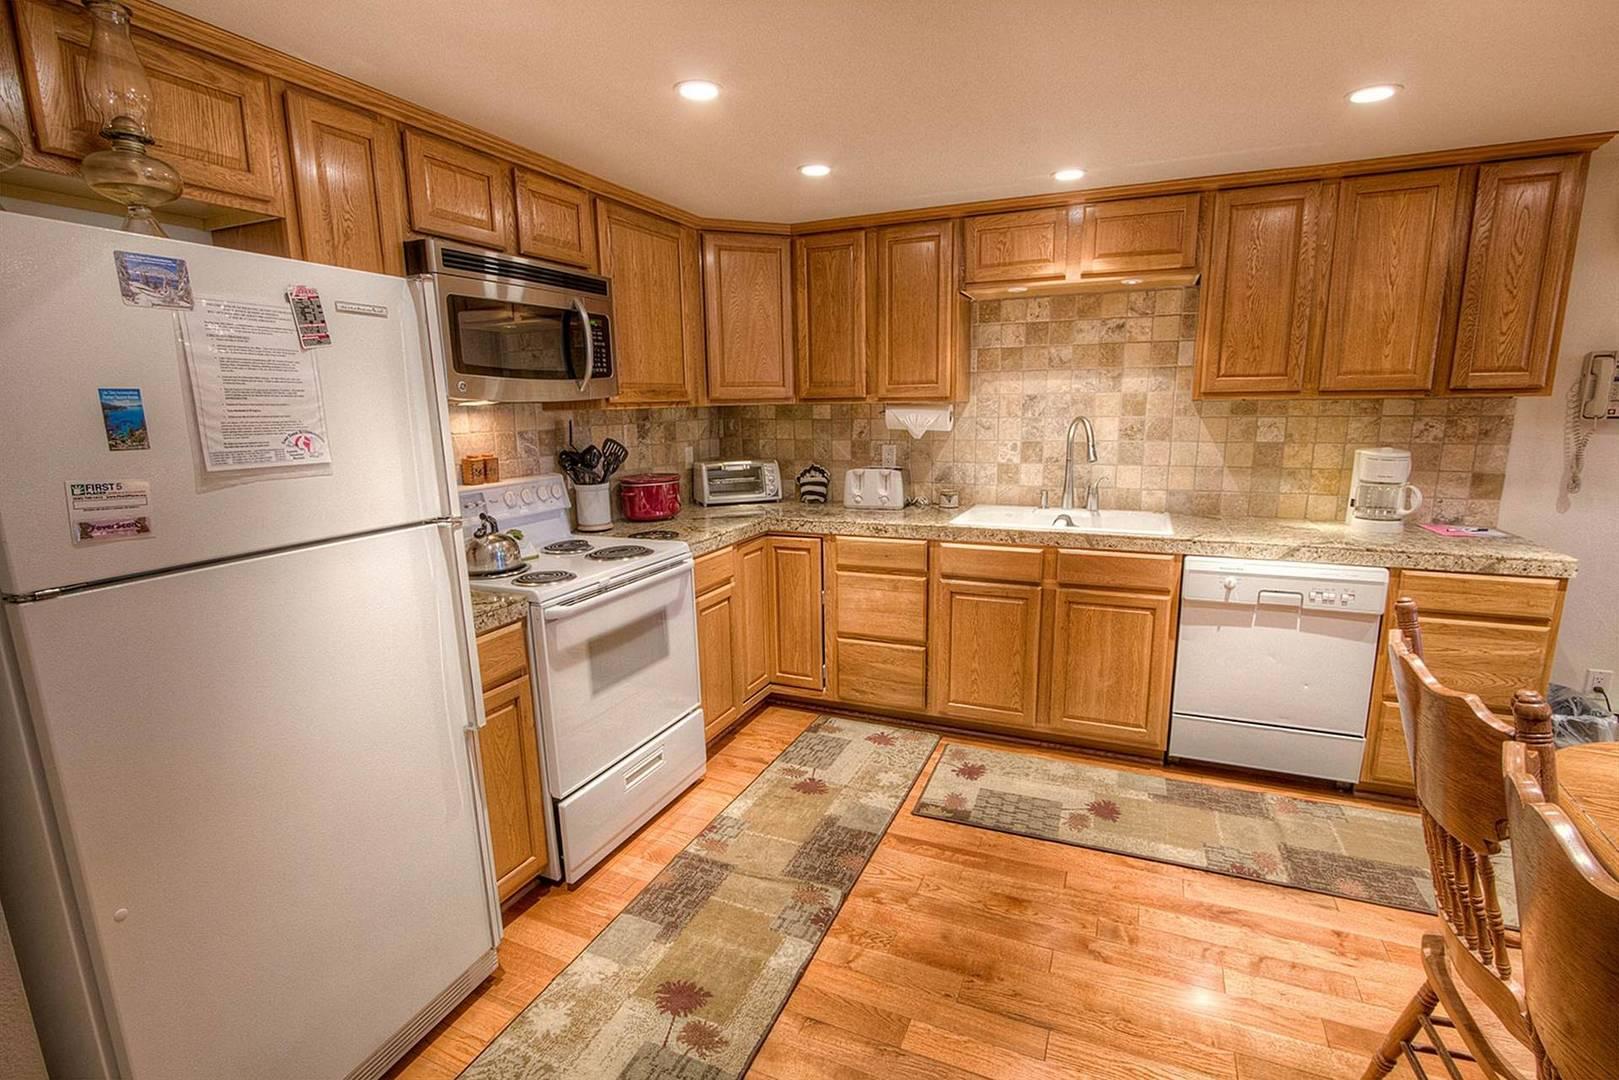 msc1002 kitchen